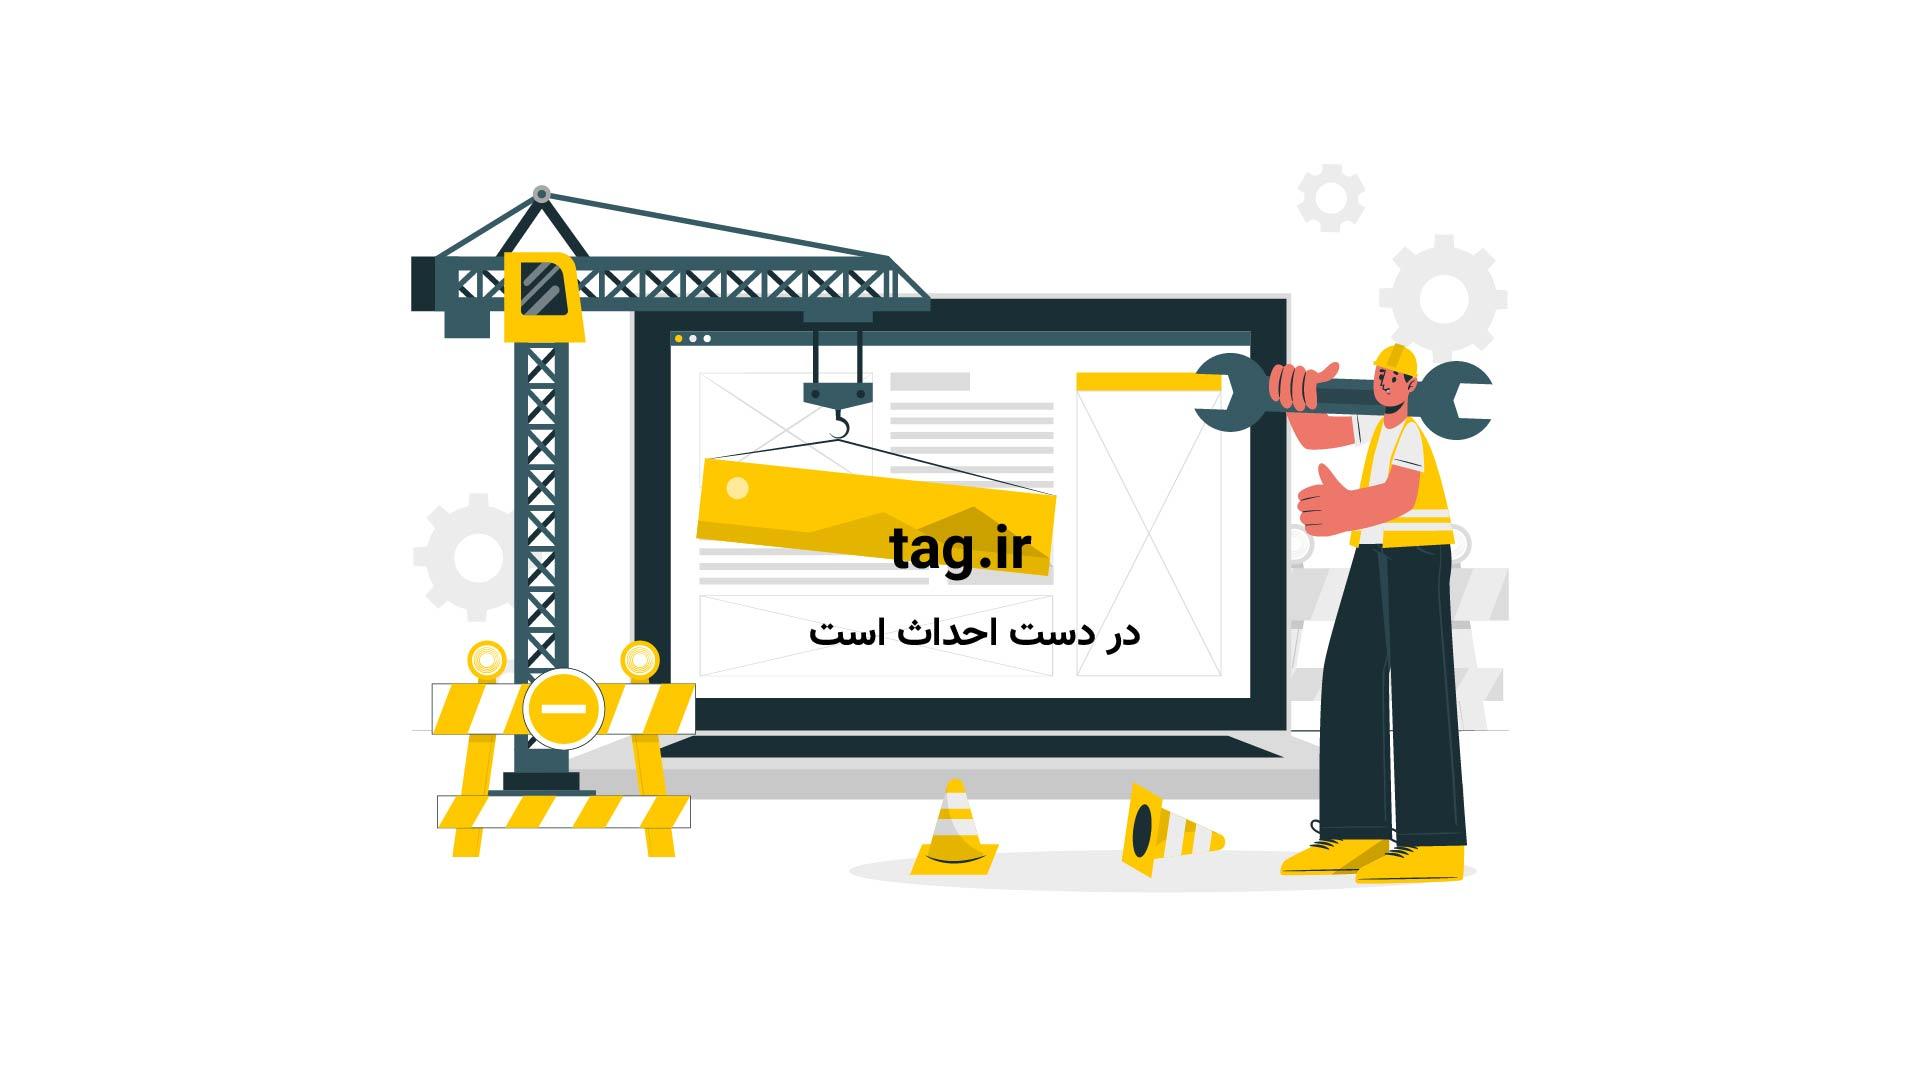 گارد پلیس زن ژاپن | تگ